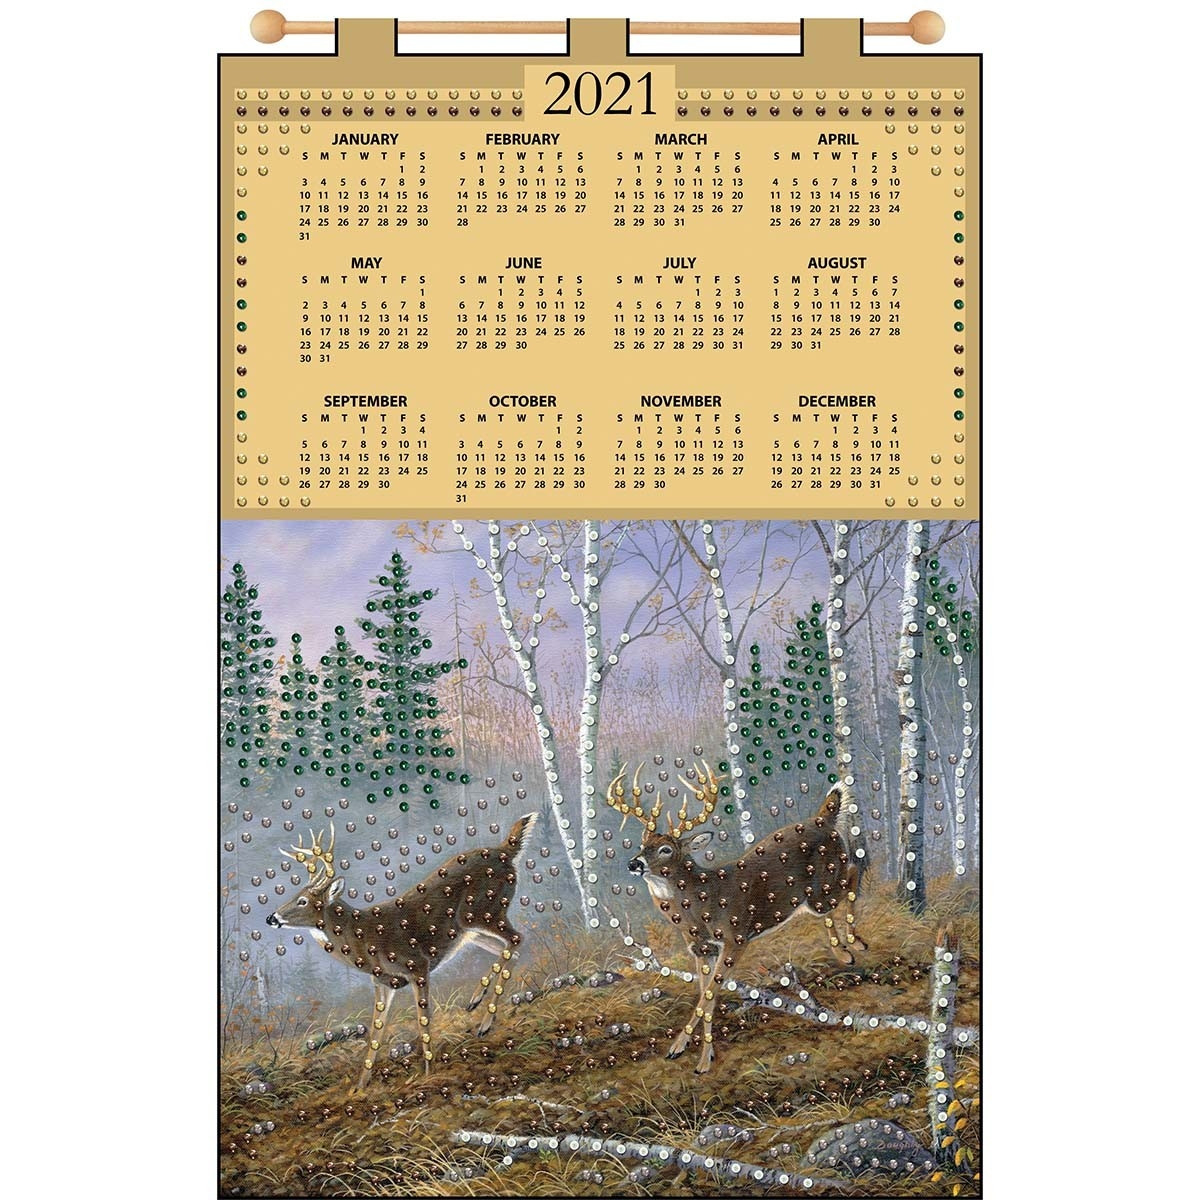 Indiana 2021 Deer Calender   Calendar Template Printable  Deer Rut Southern Indiana 2021